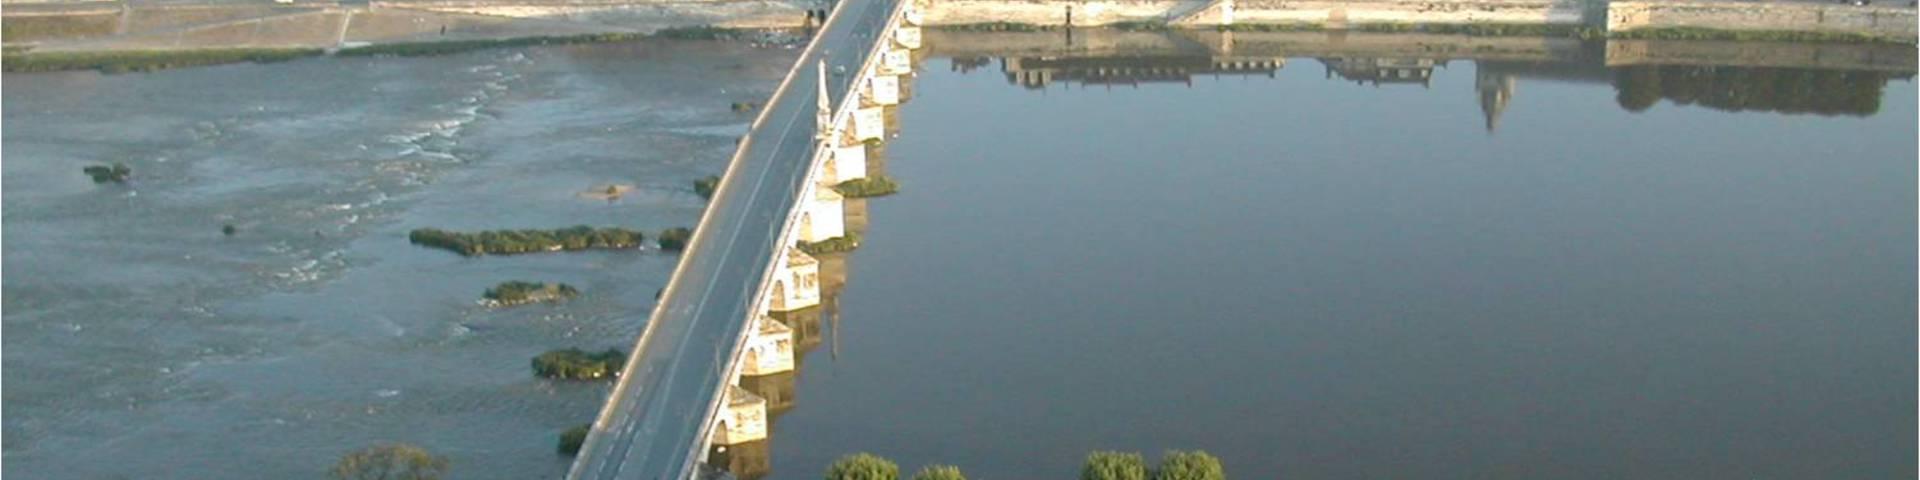 The Jacques Gabriel Bridge in the city of Blois